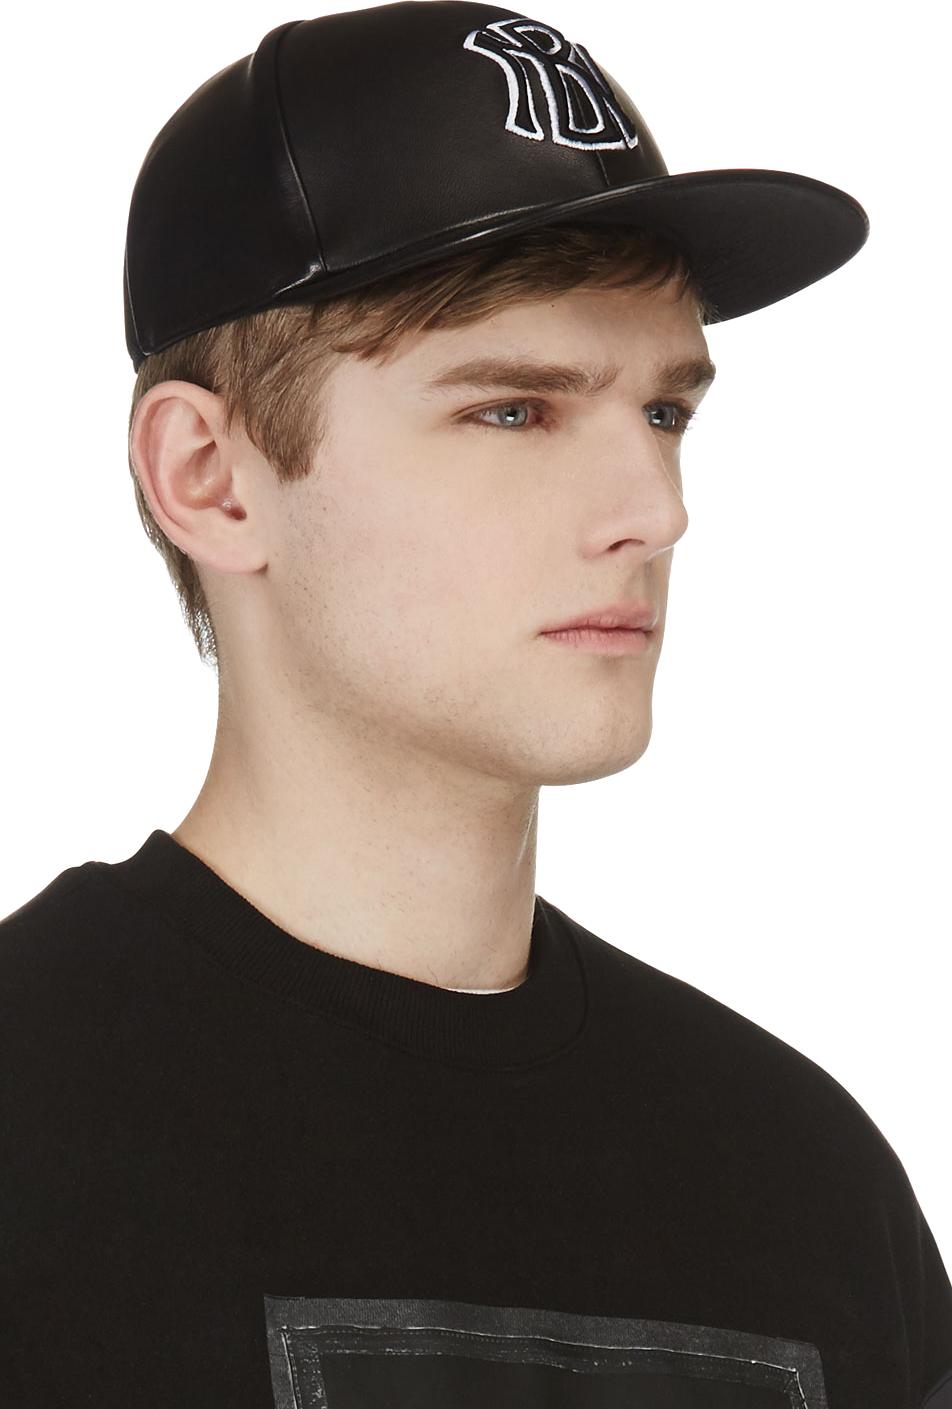 Lyst Neil Barrett Black Leather Embroidered Logo